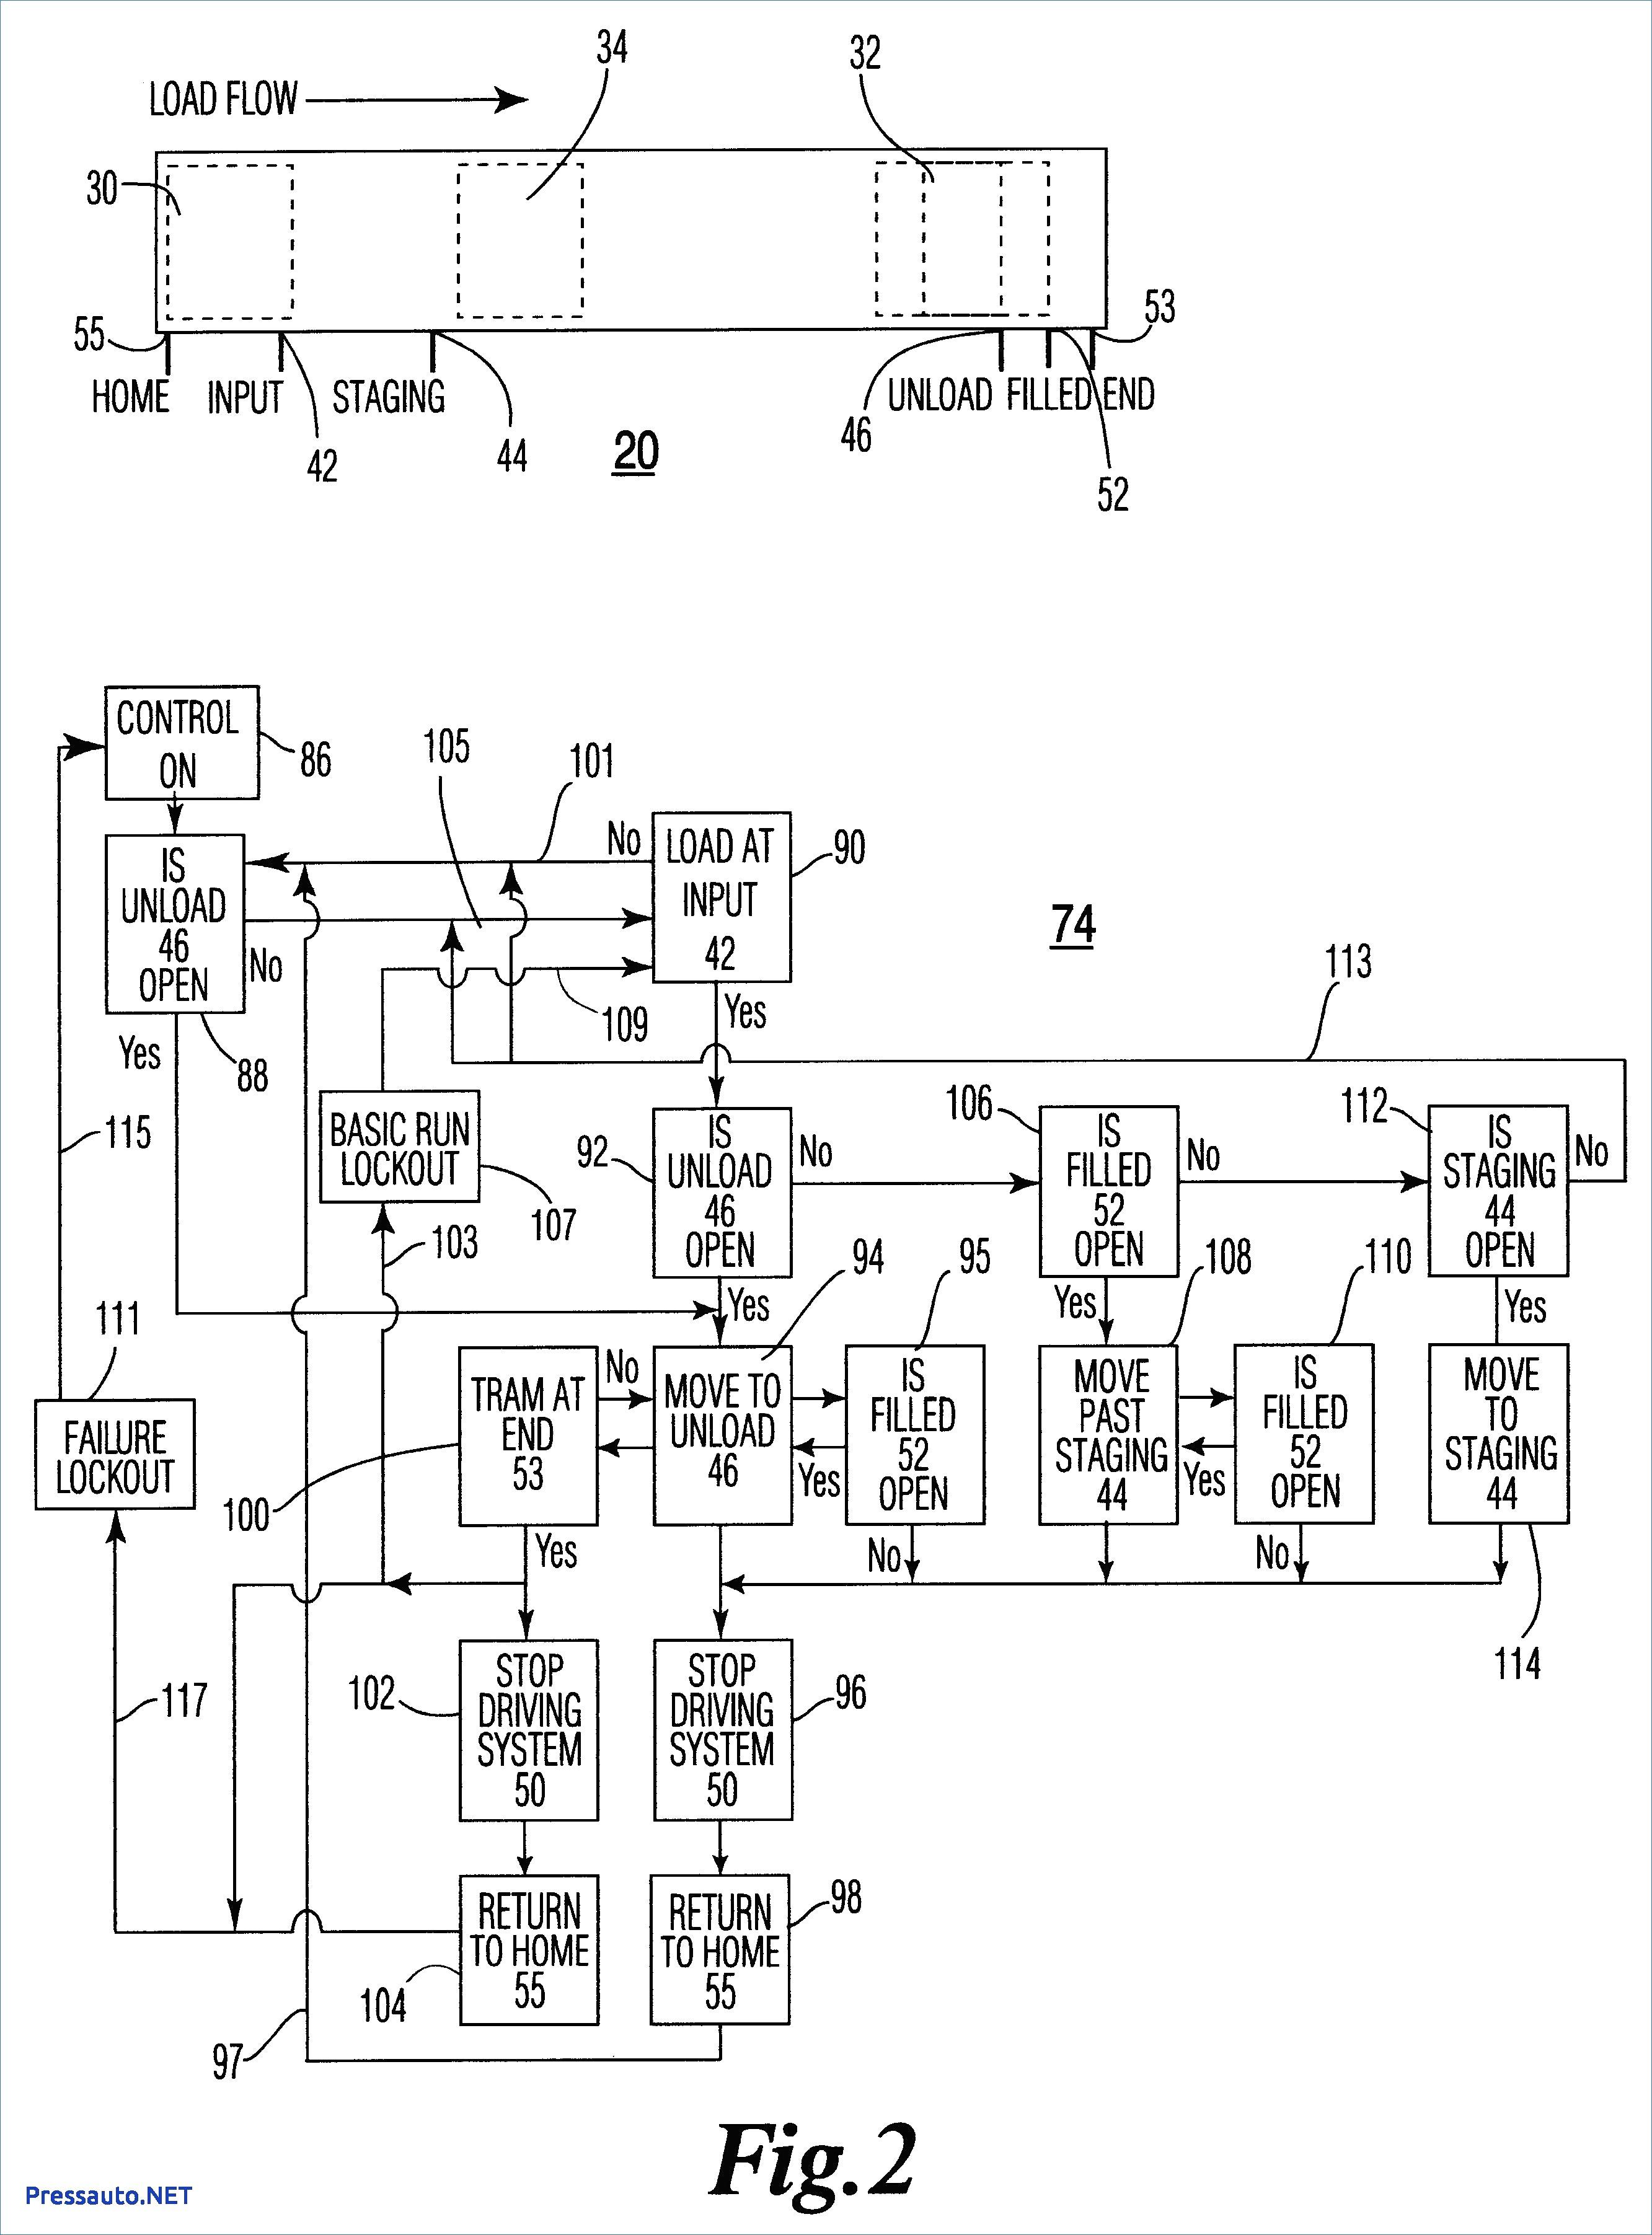 Acme Transformer Wiring Diagrams 277 120 Acme Circuit Diagrams - Acme Transformer Wiring Diagram